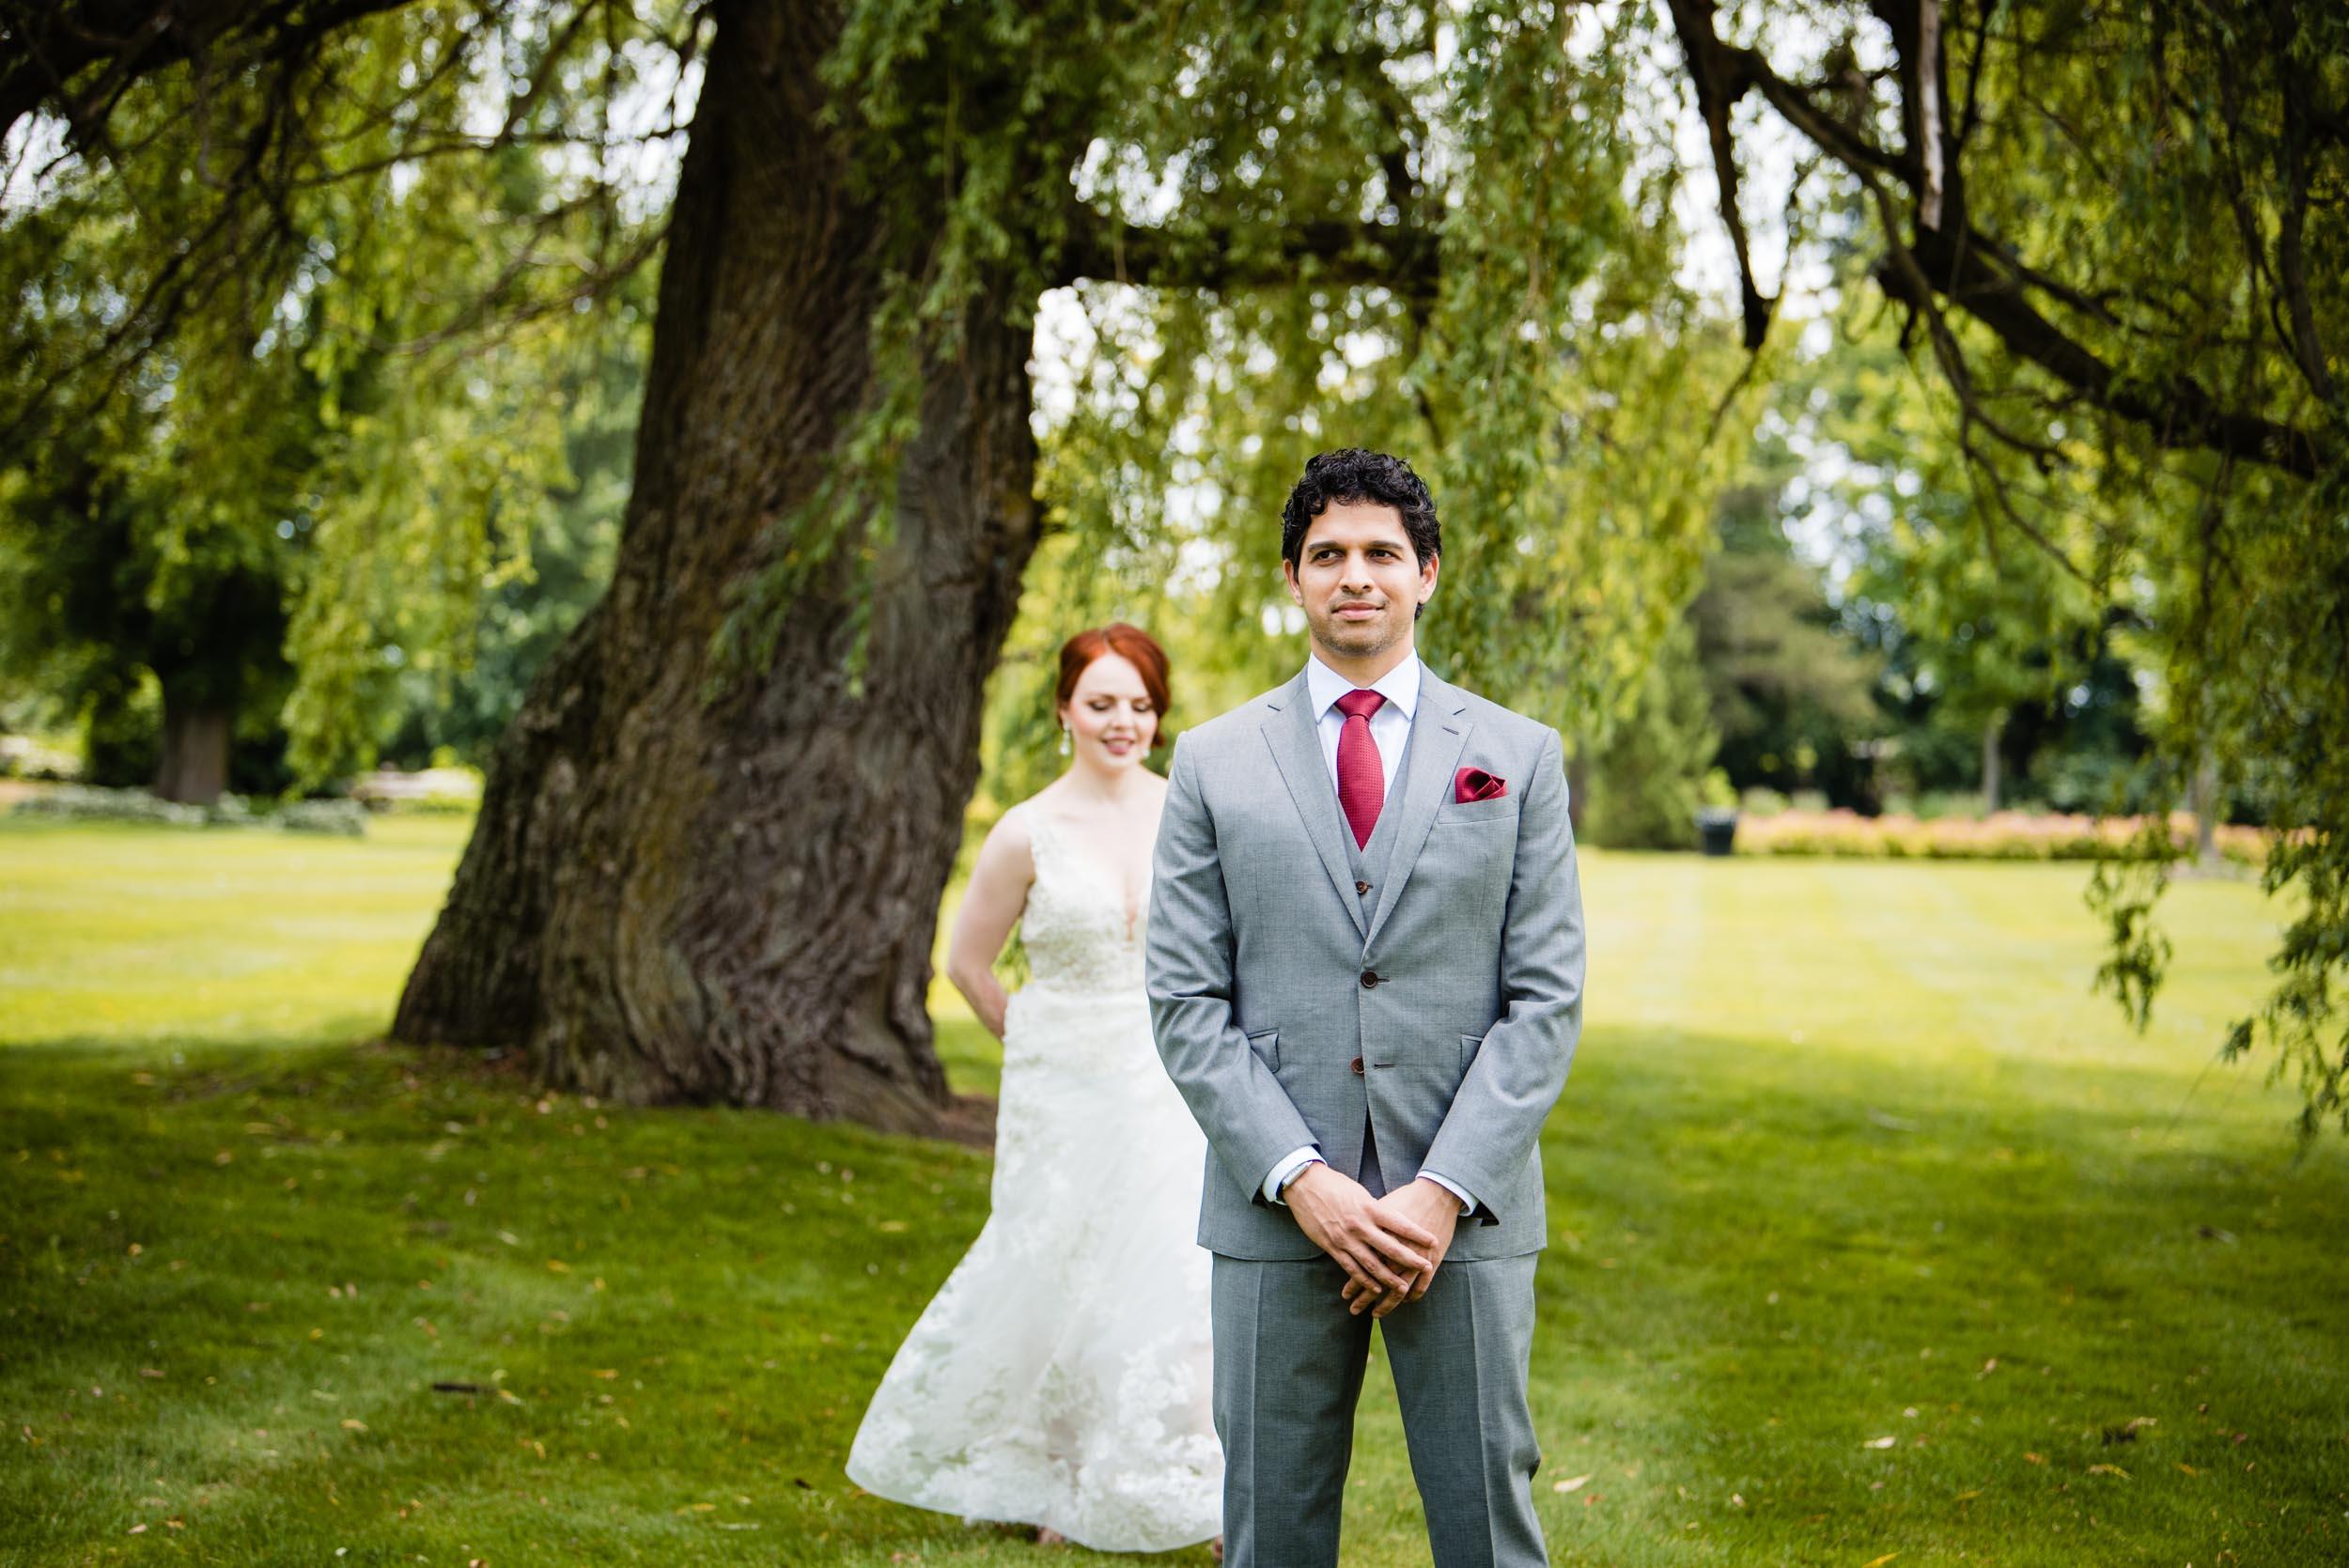 luxury-indian-wedding-royal-ambassador-toronto (8).jpg